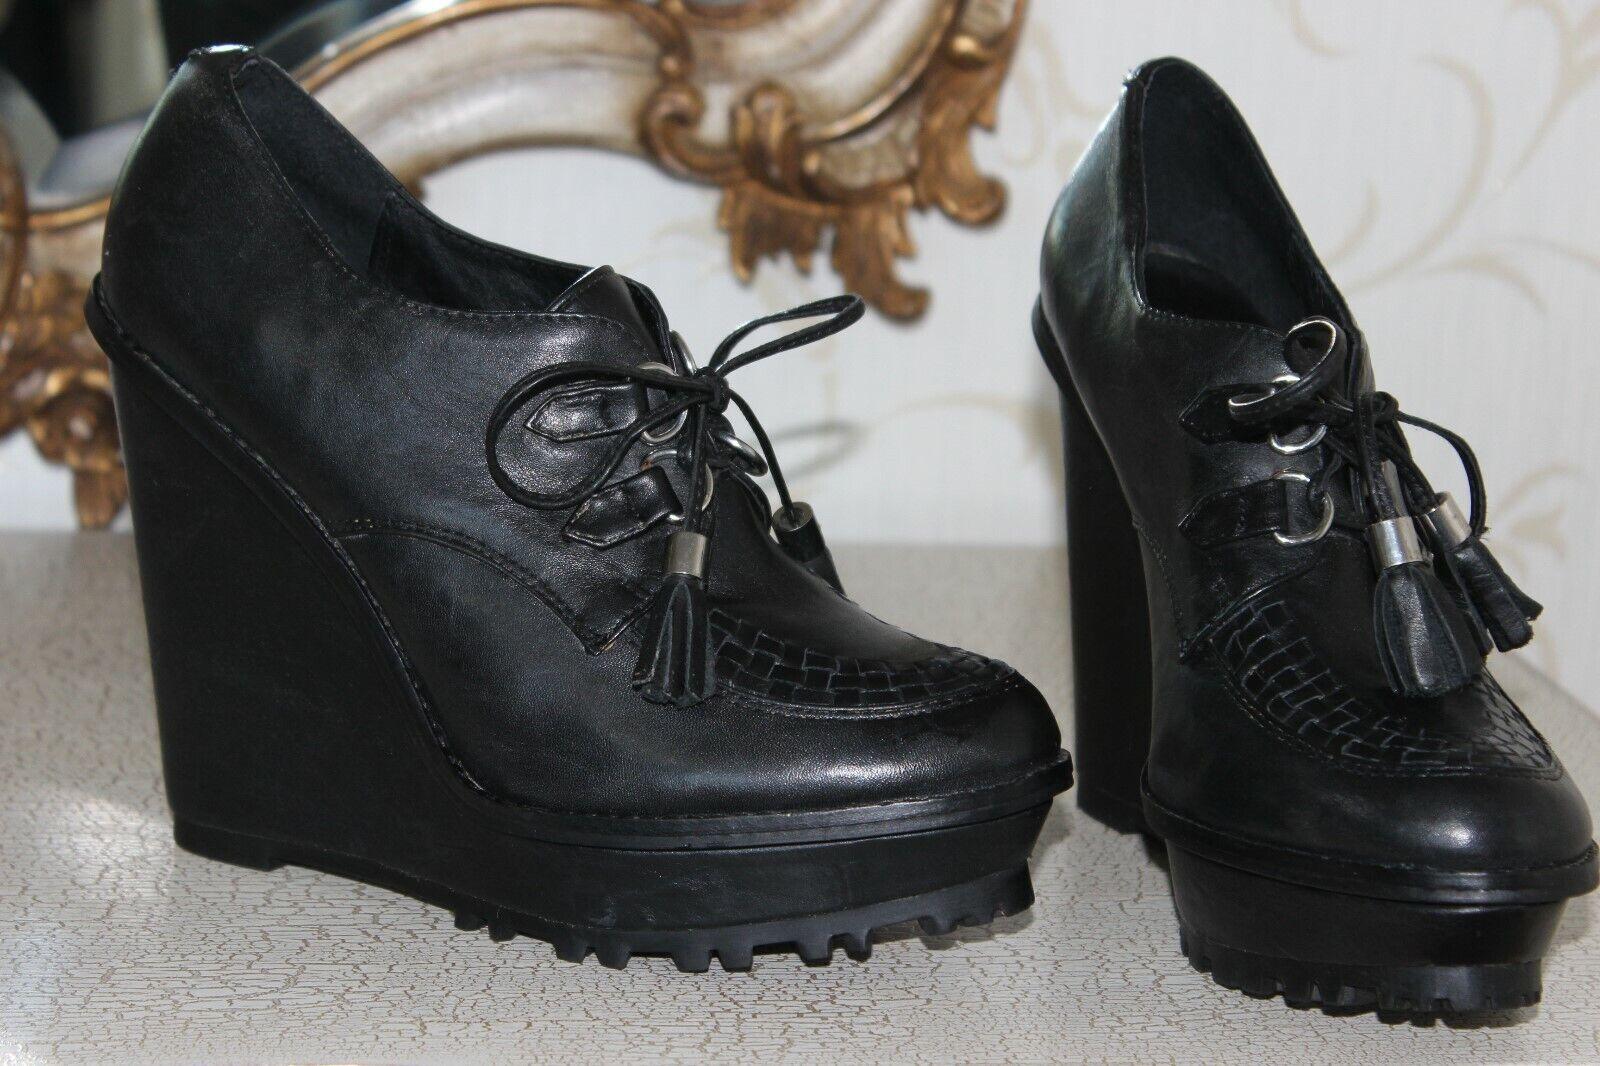 ALDO 100% Black Genuine Leather Ladies Platform Shoes Heels Size 7